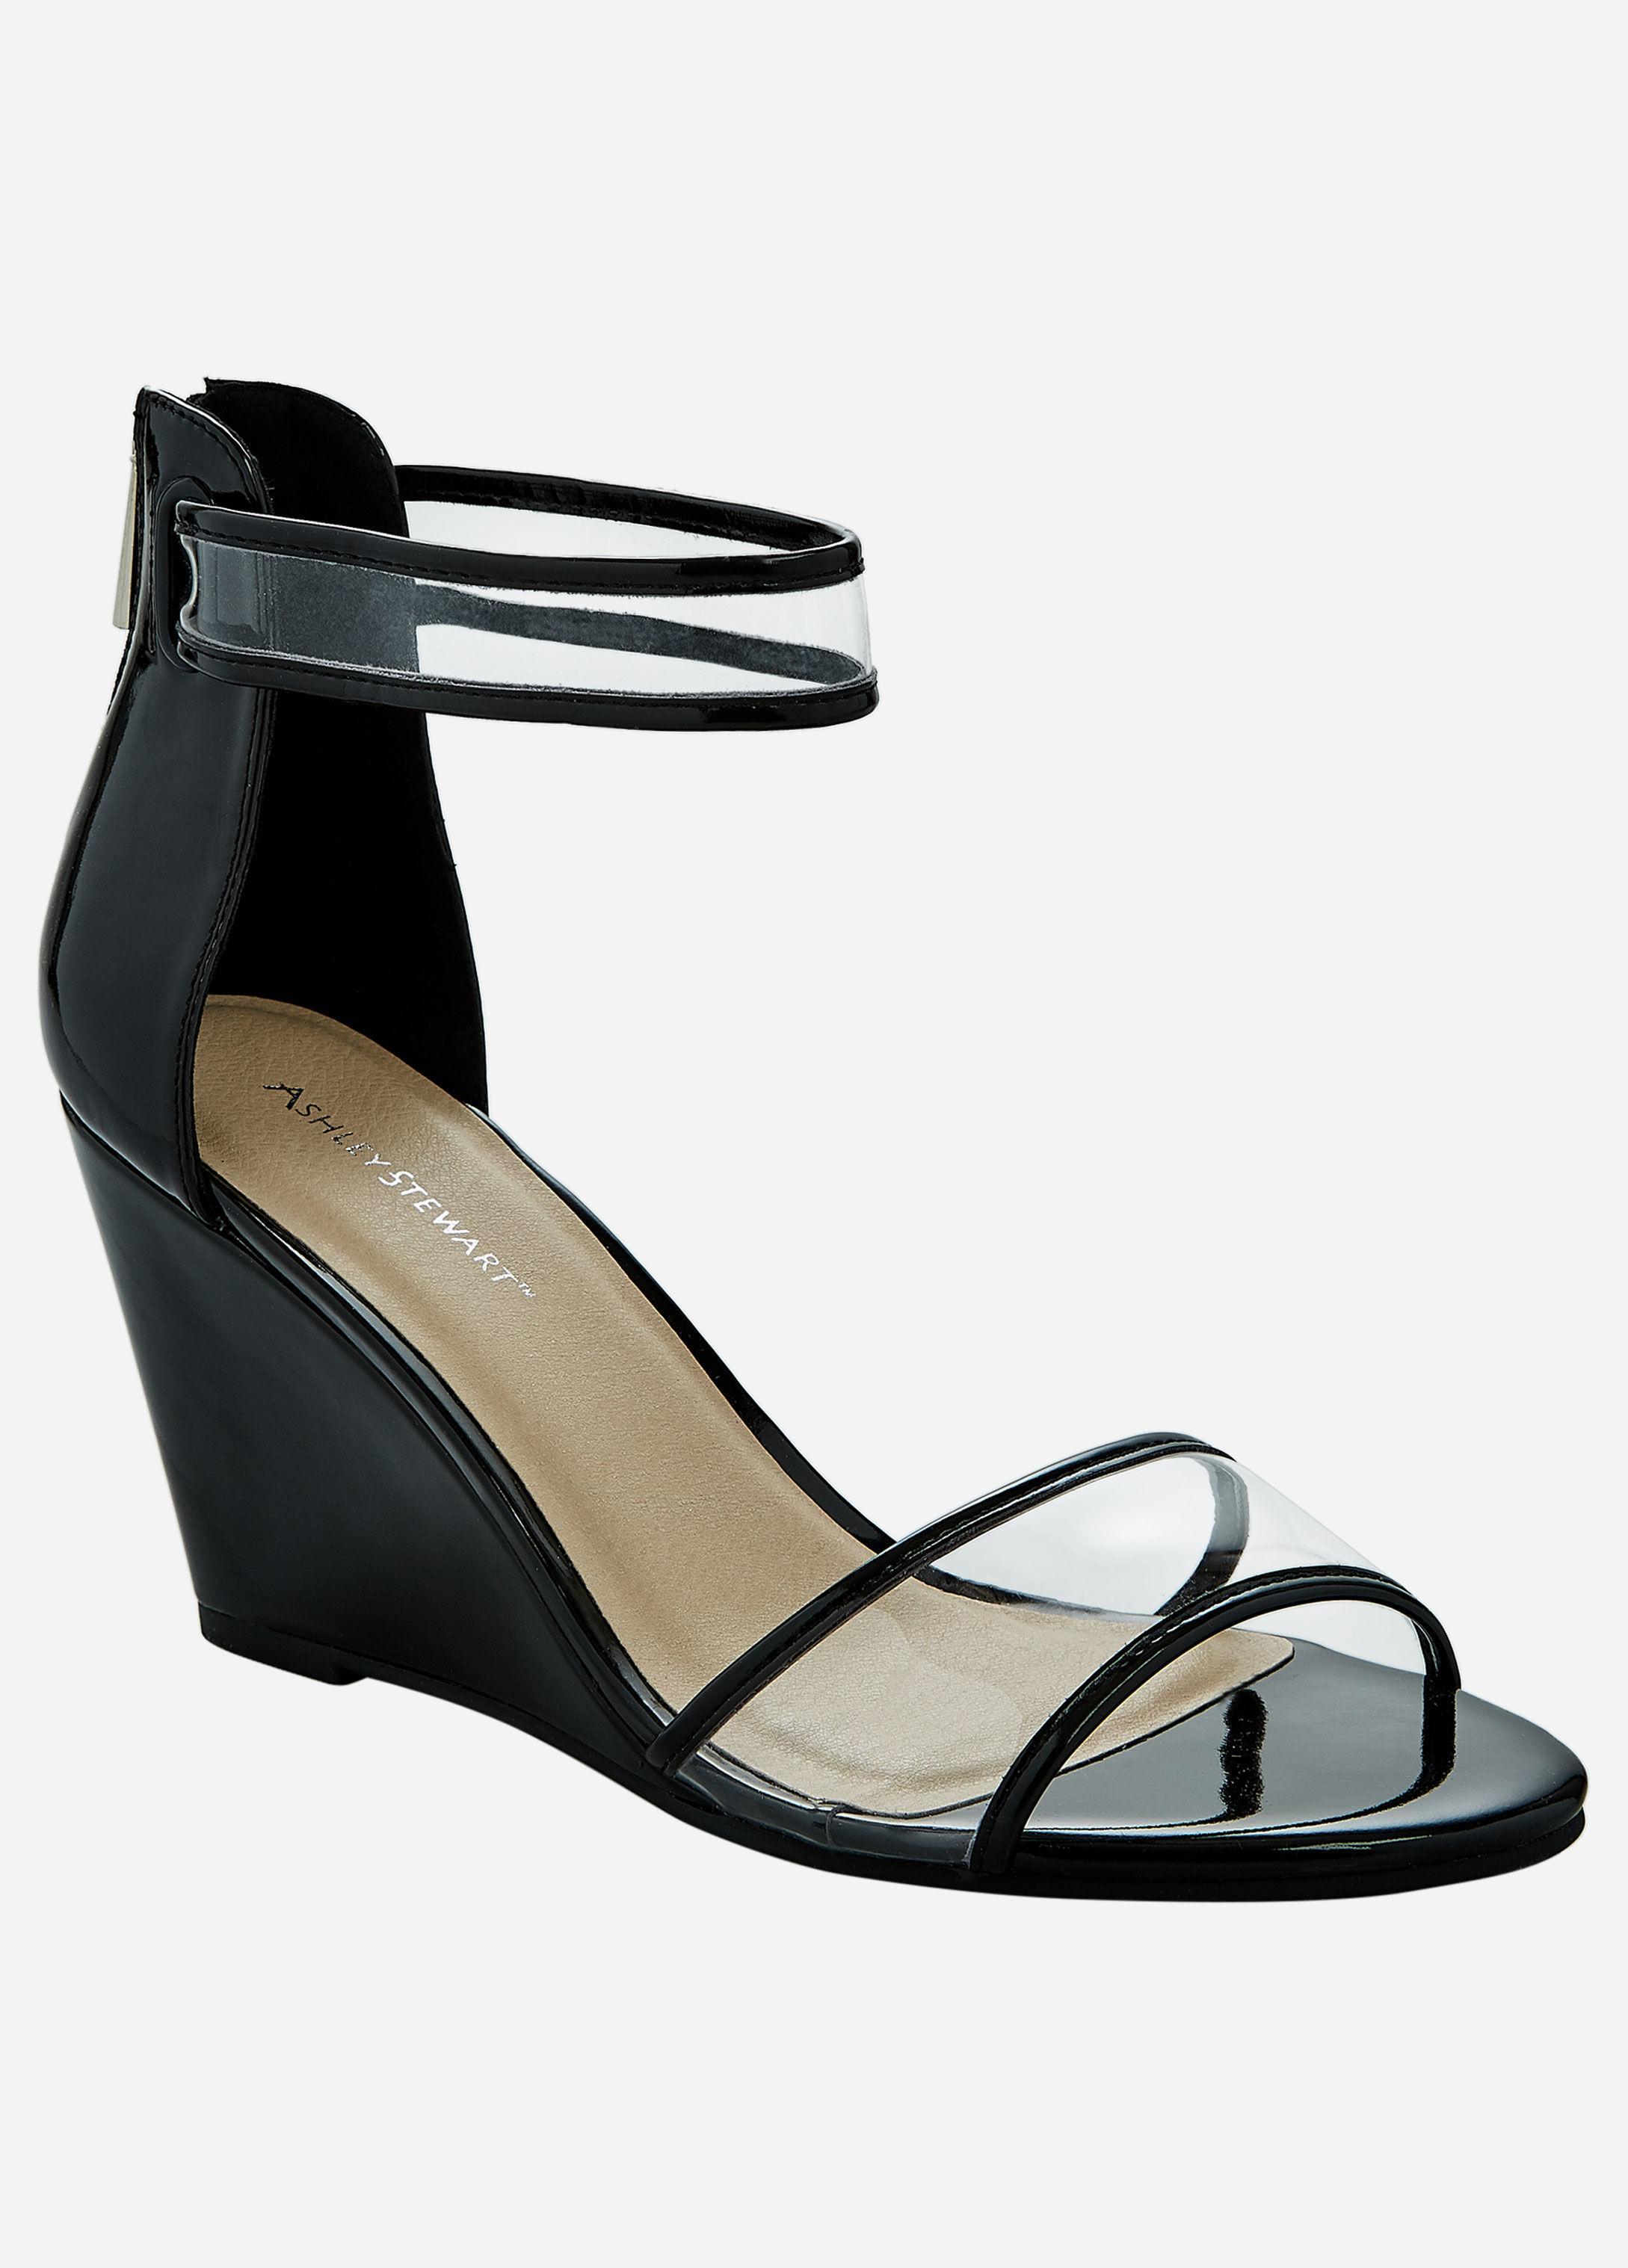 14d149c3b18 Lyst - Ashley Stewart Skinny Wedge Wide Width Heel in Black